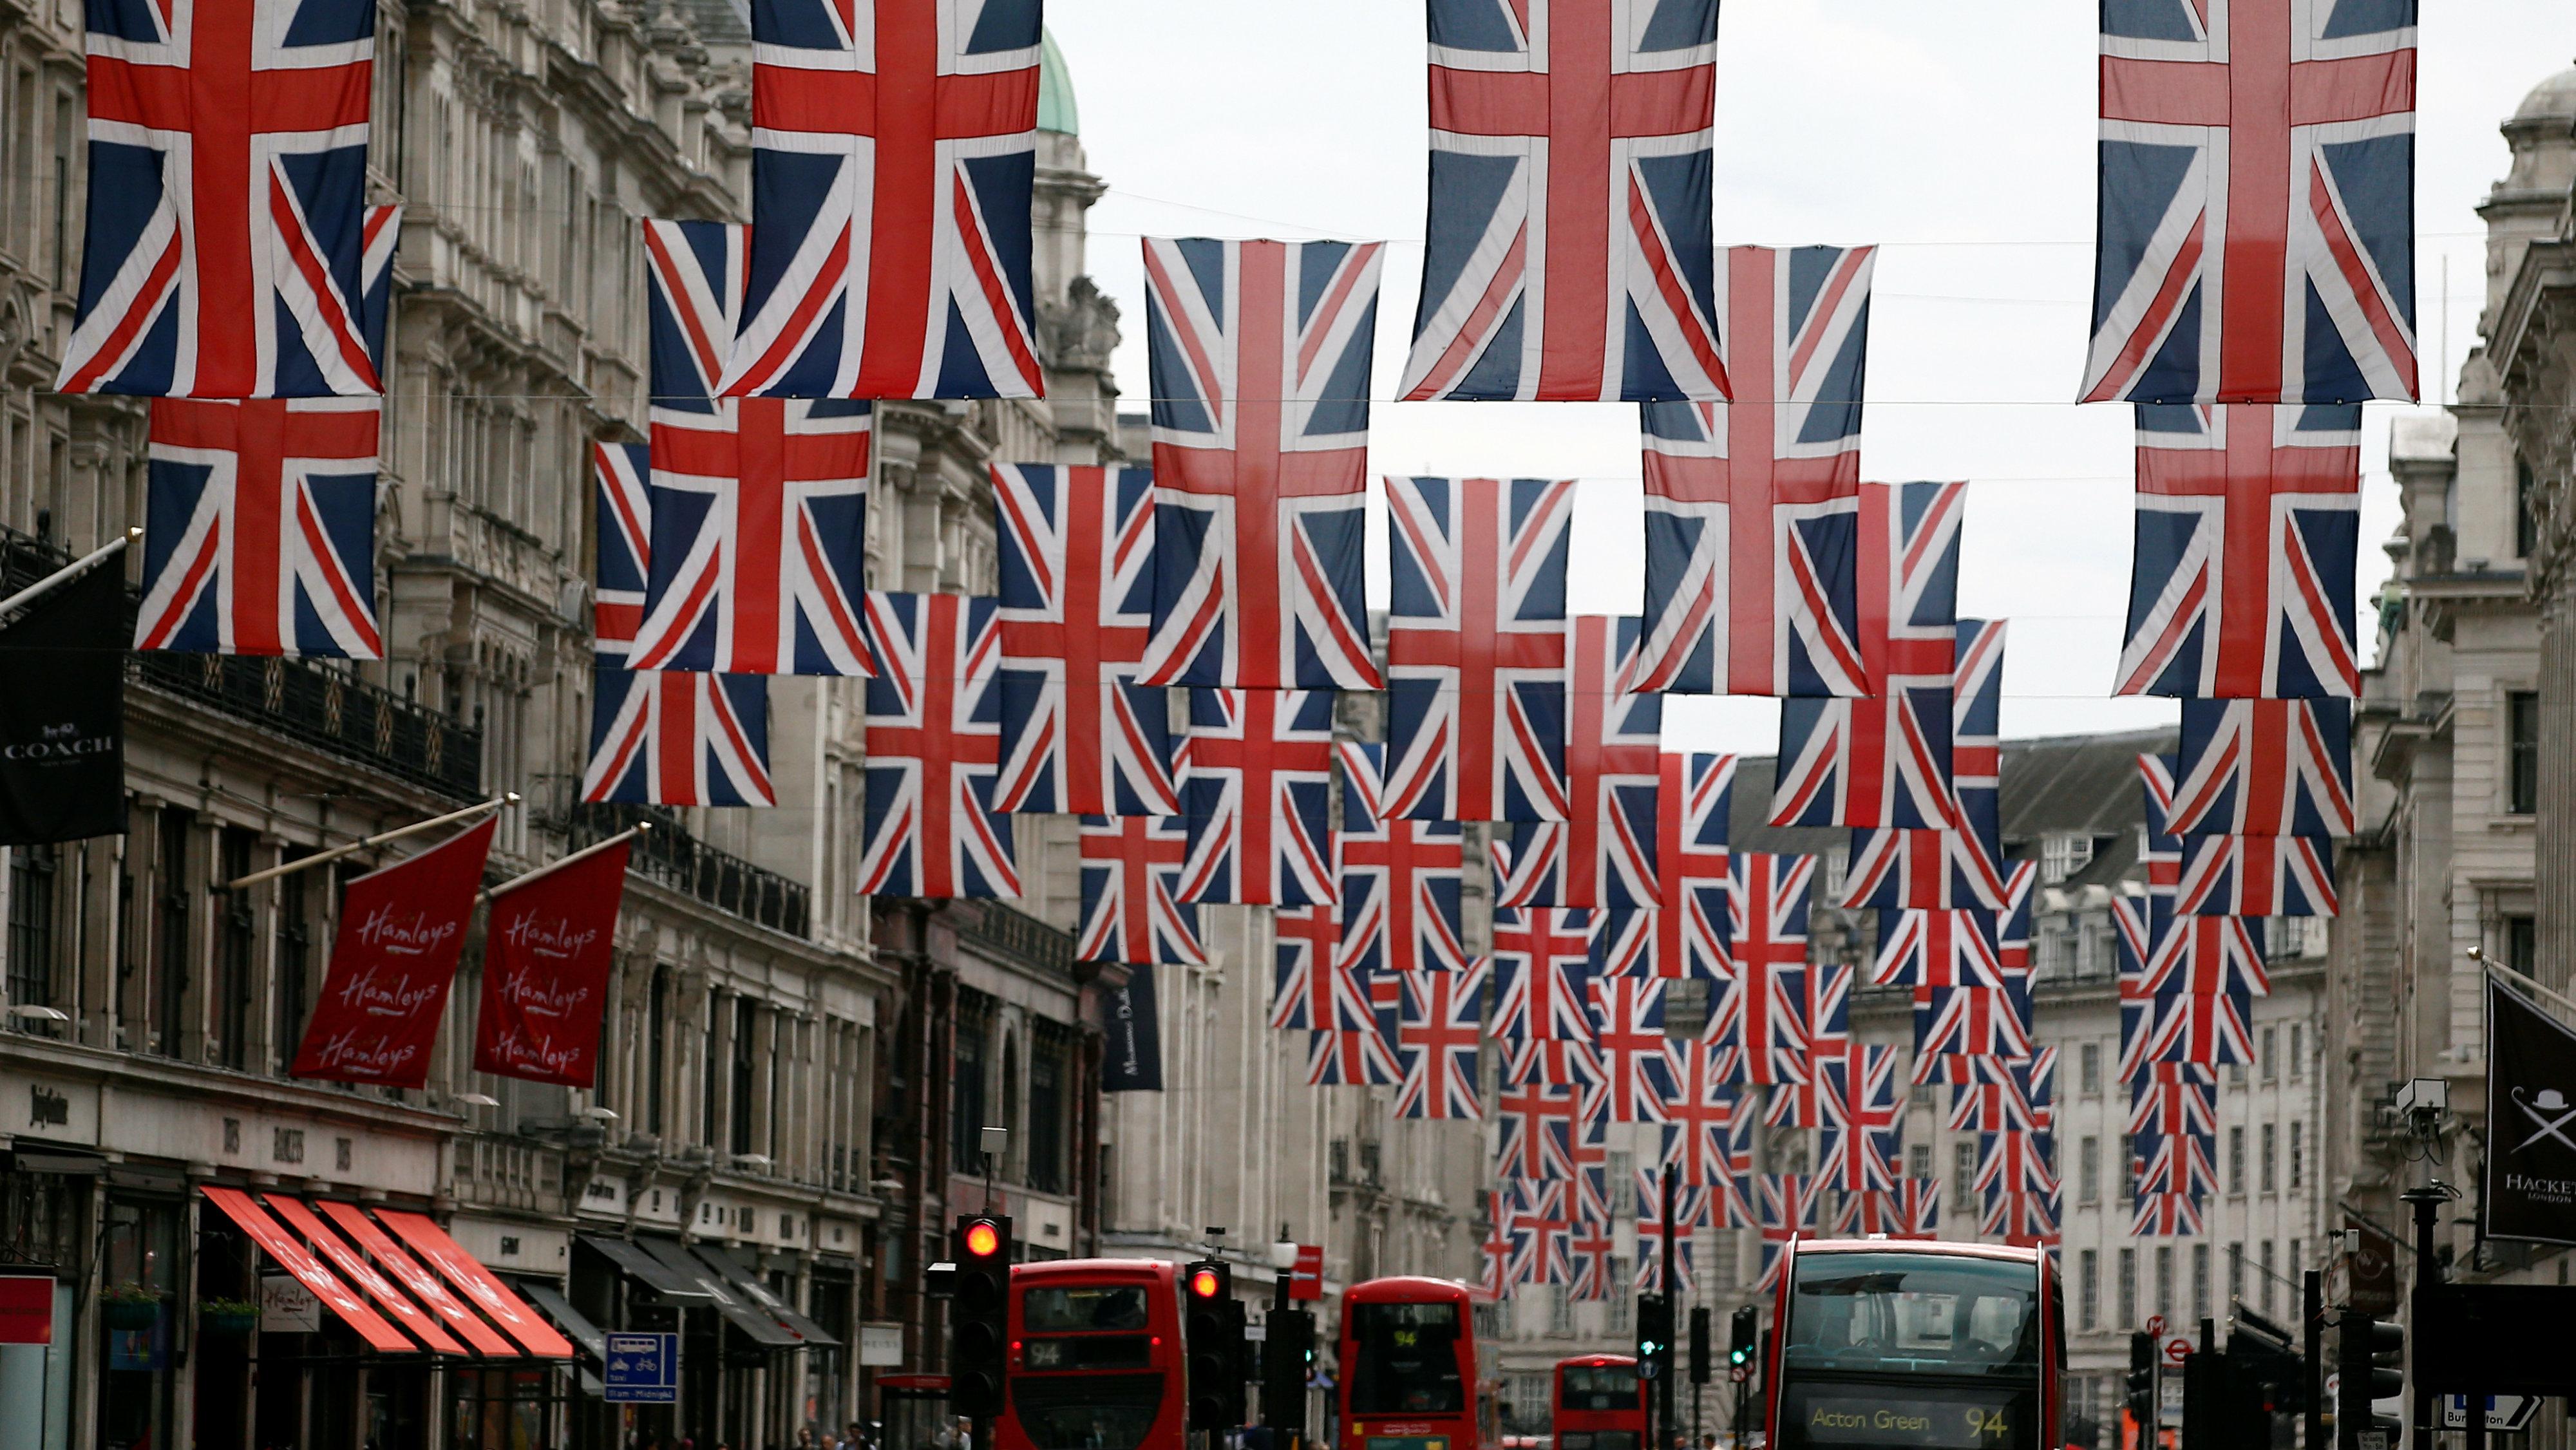 Union jacks for royal wedding